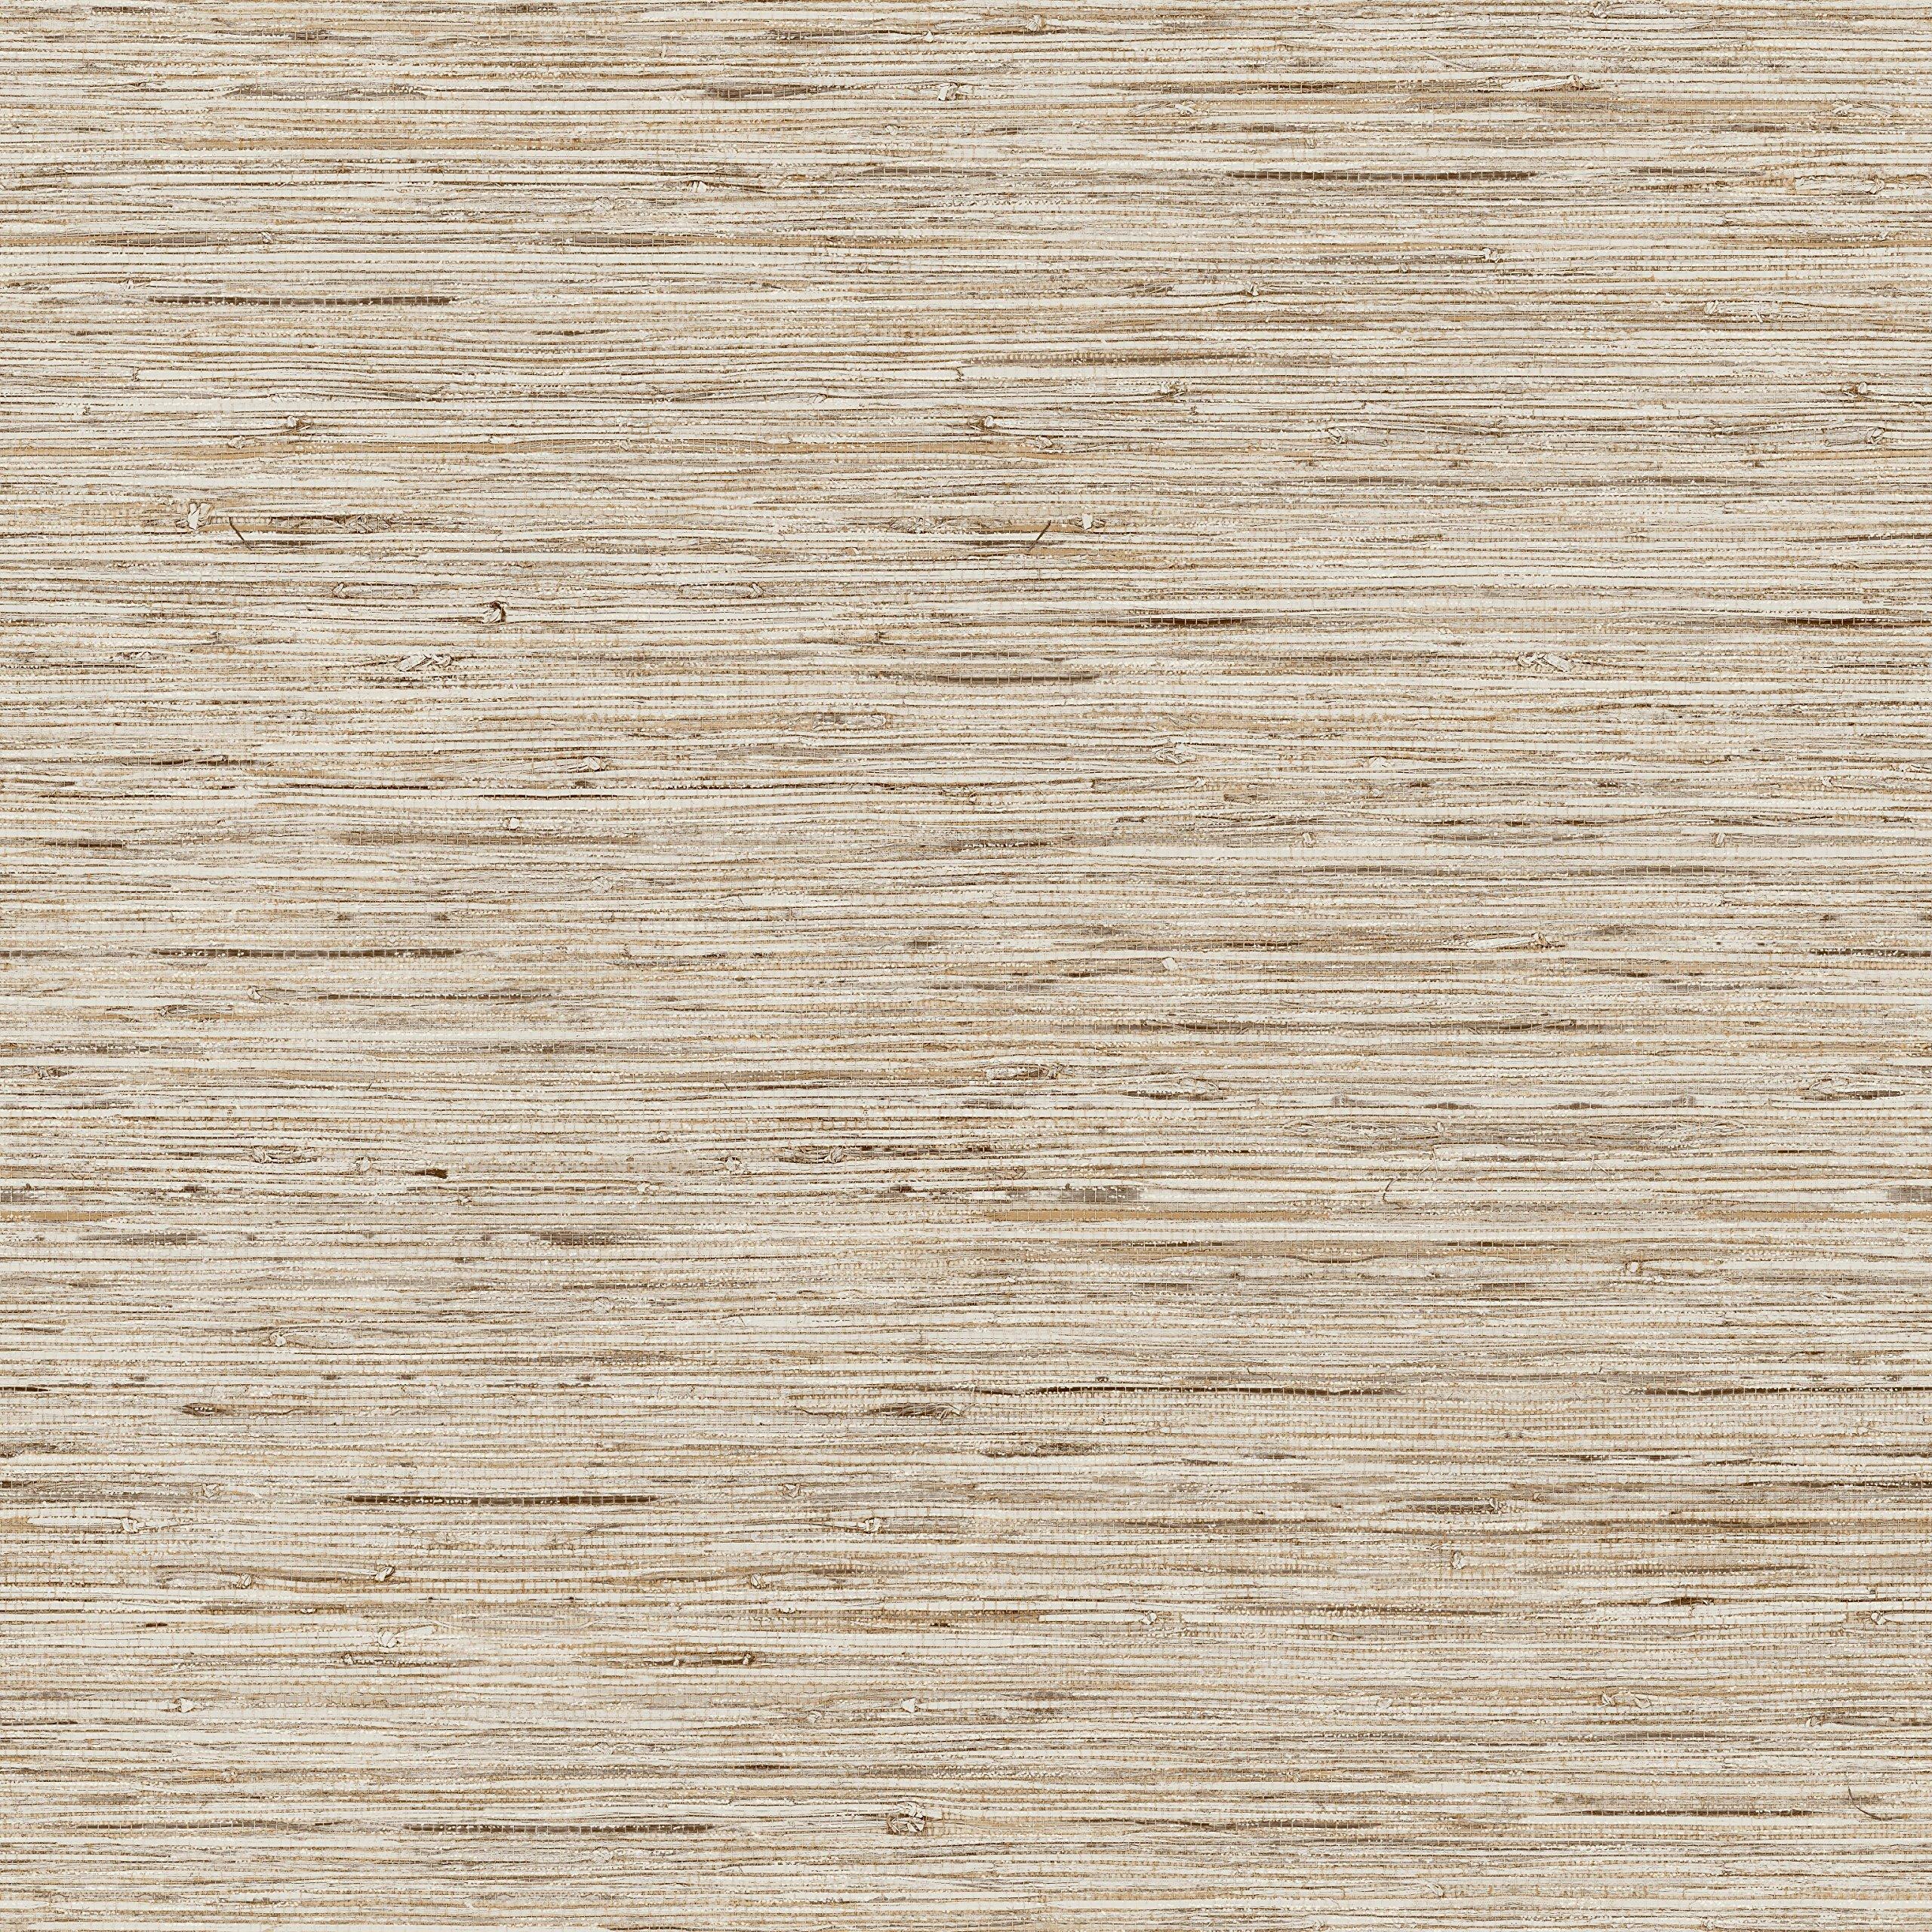 RoomMates RMK9031WP Grasscloth Peel and Stick Wallpaper Décor